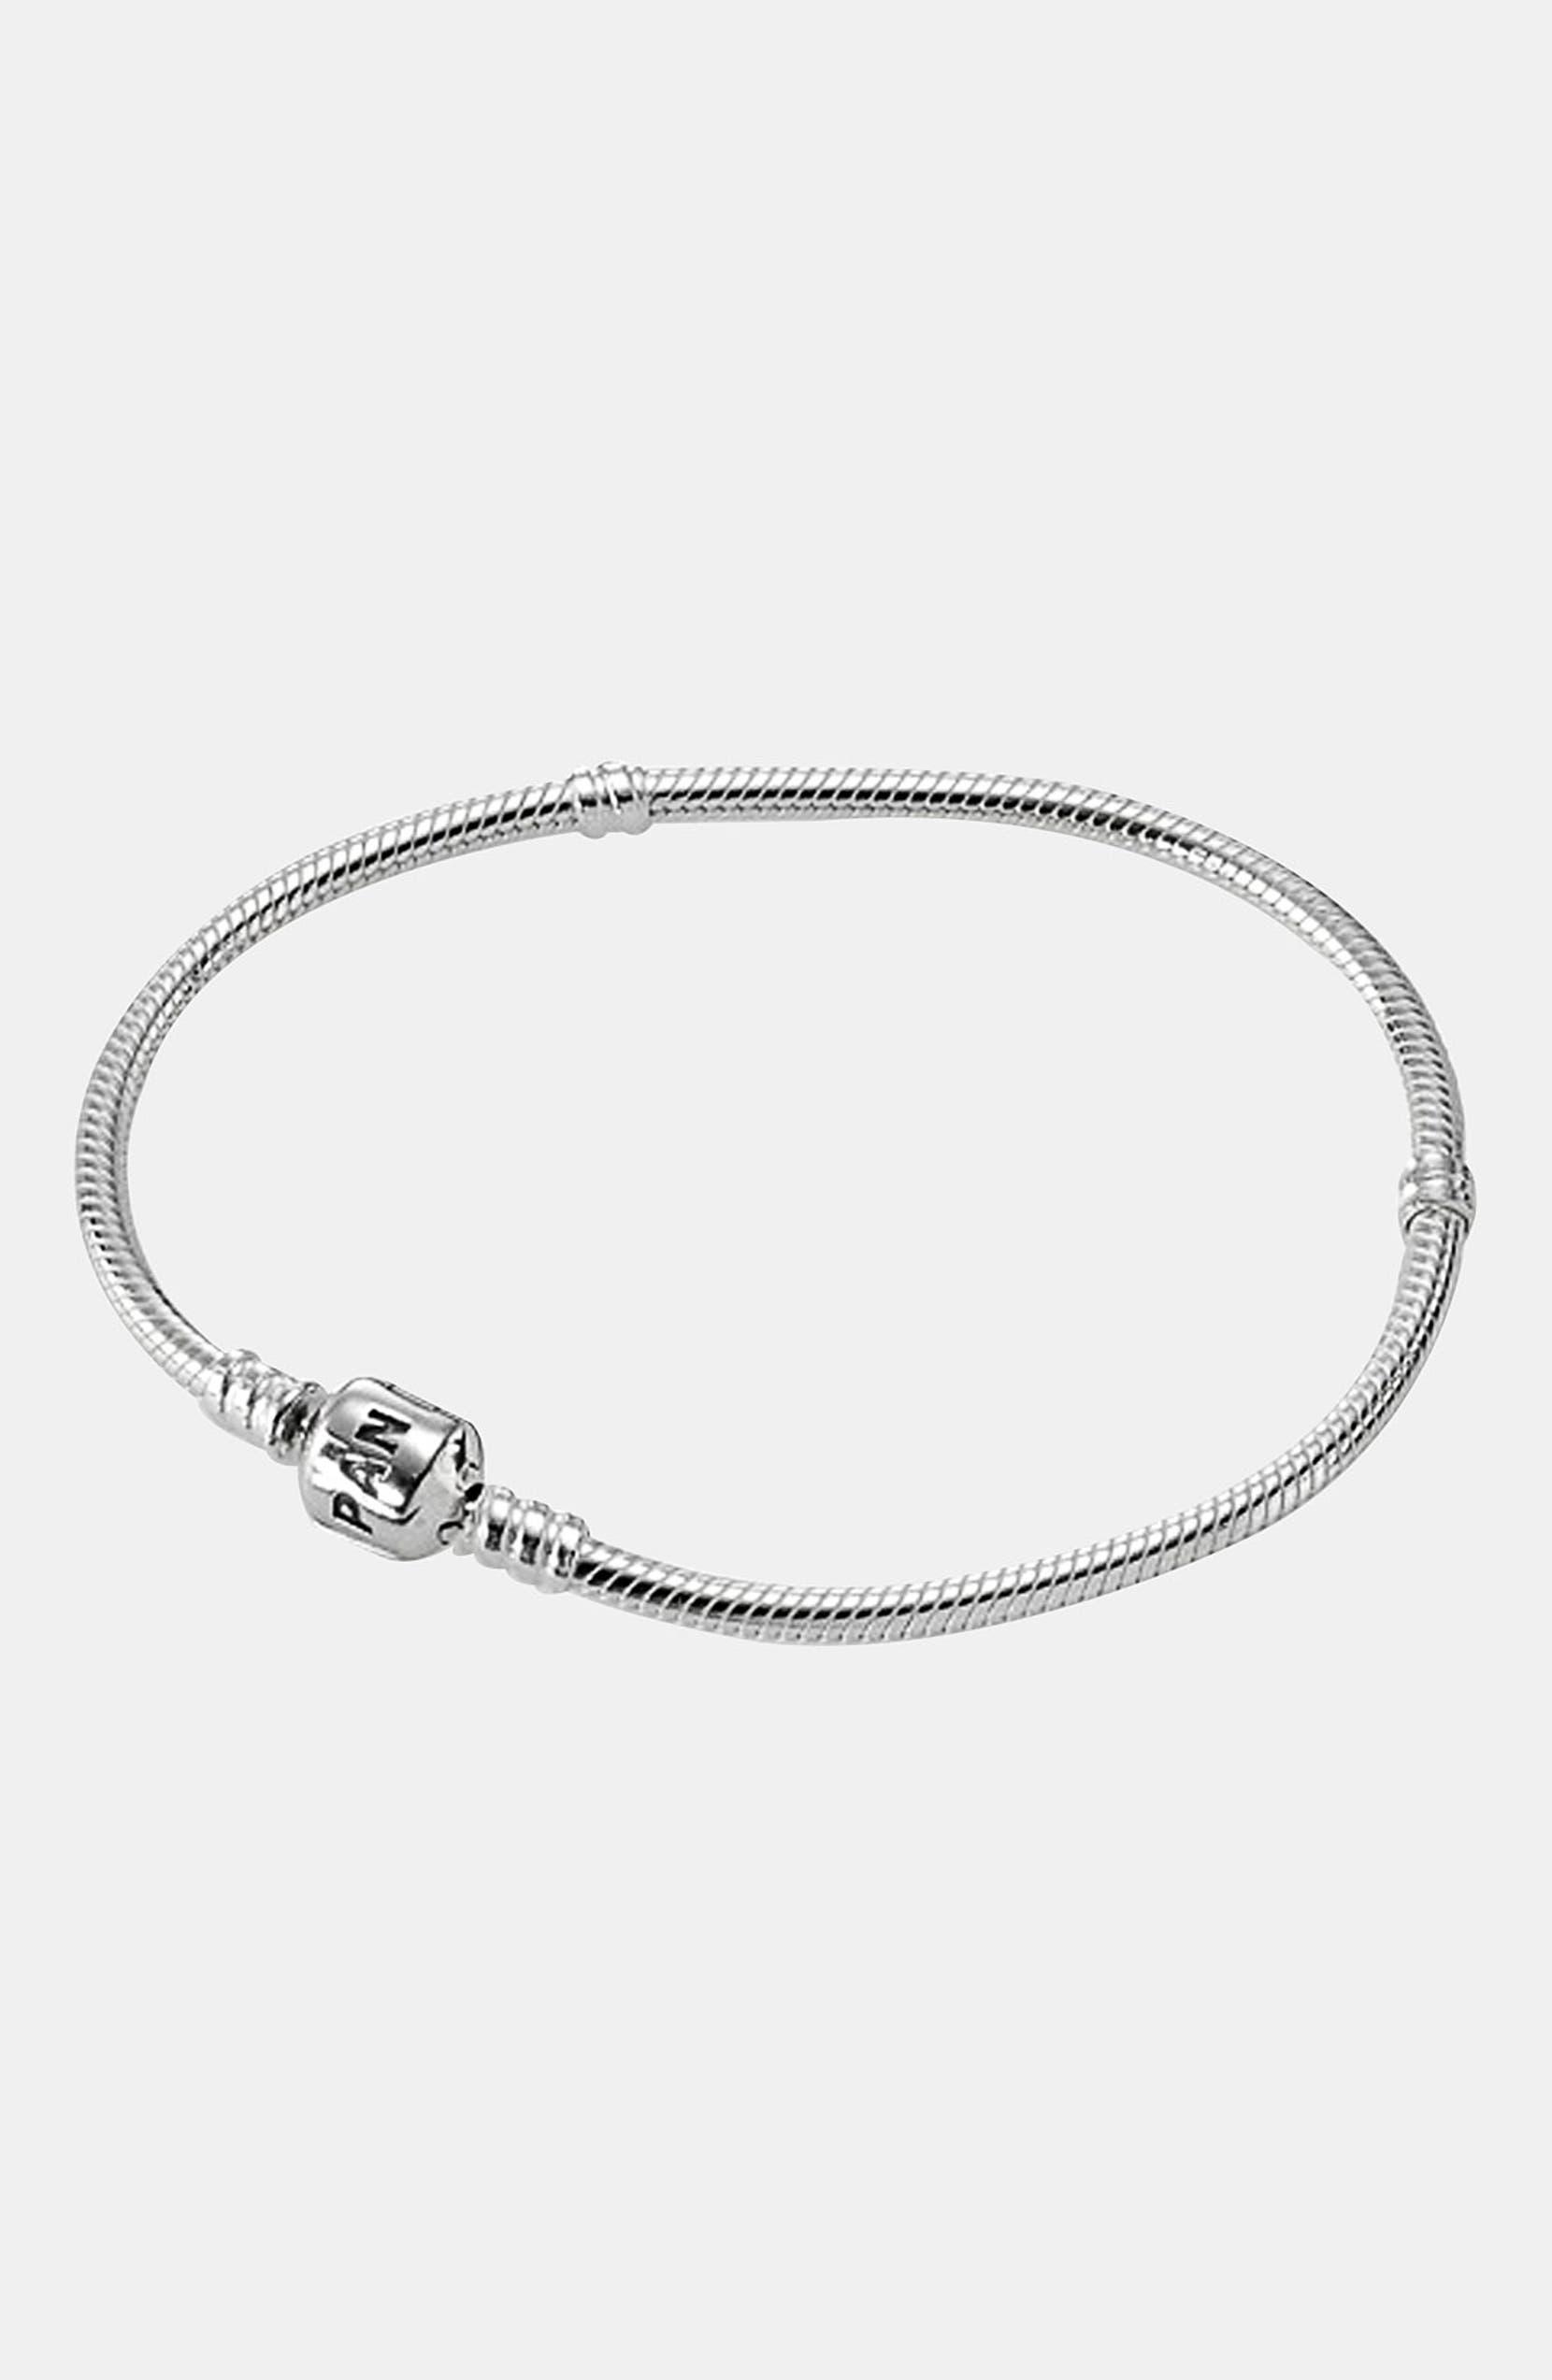 b37bffa24 PANDORA Iconic Silver Charm Bracelet | Nordstrom